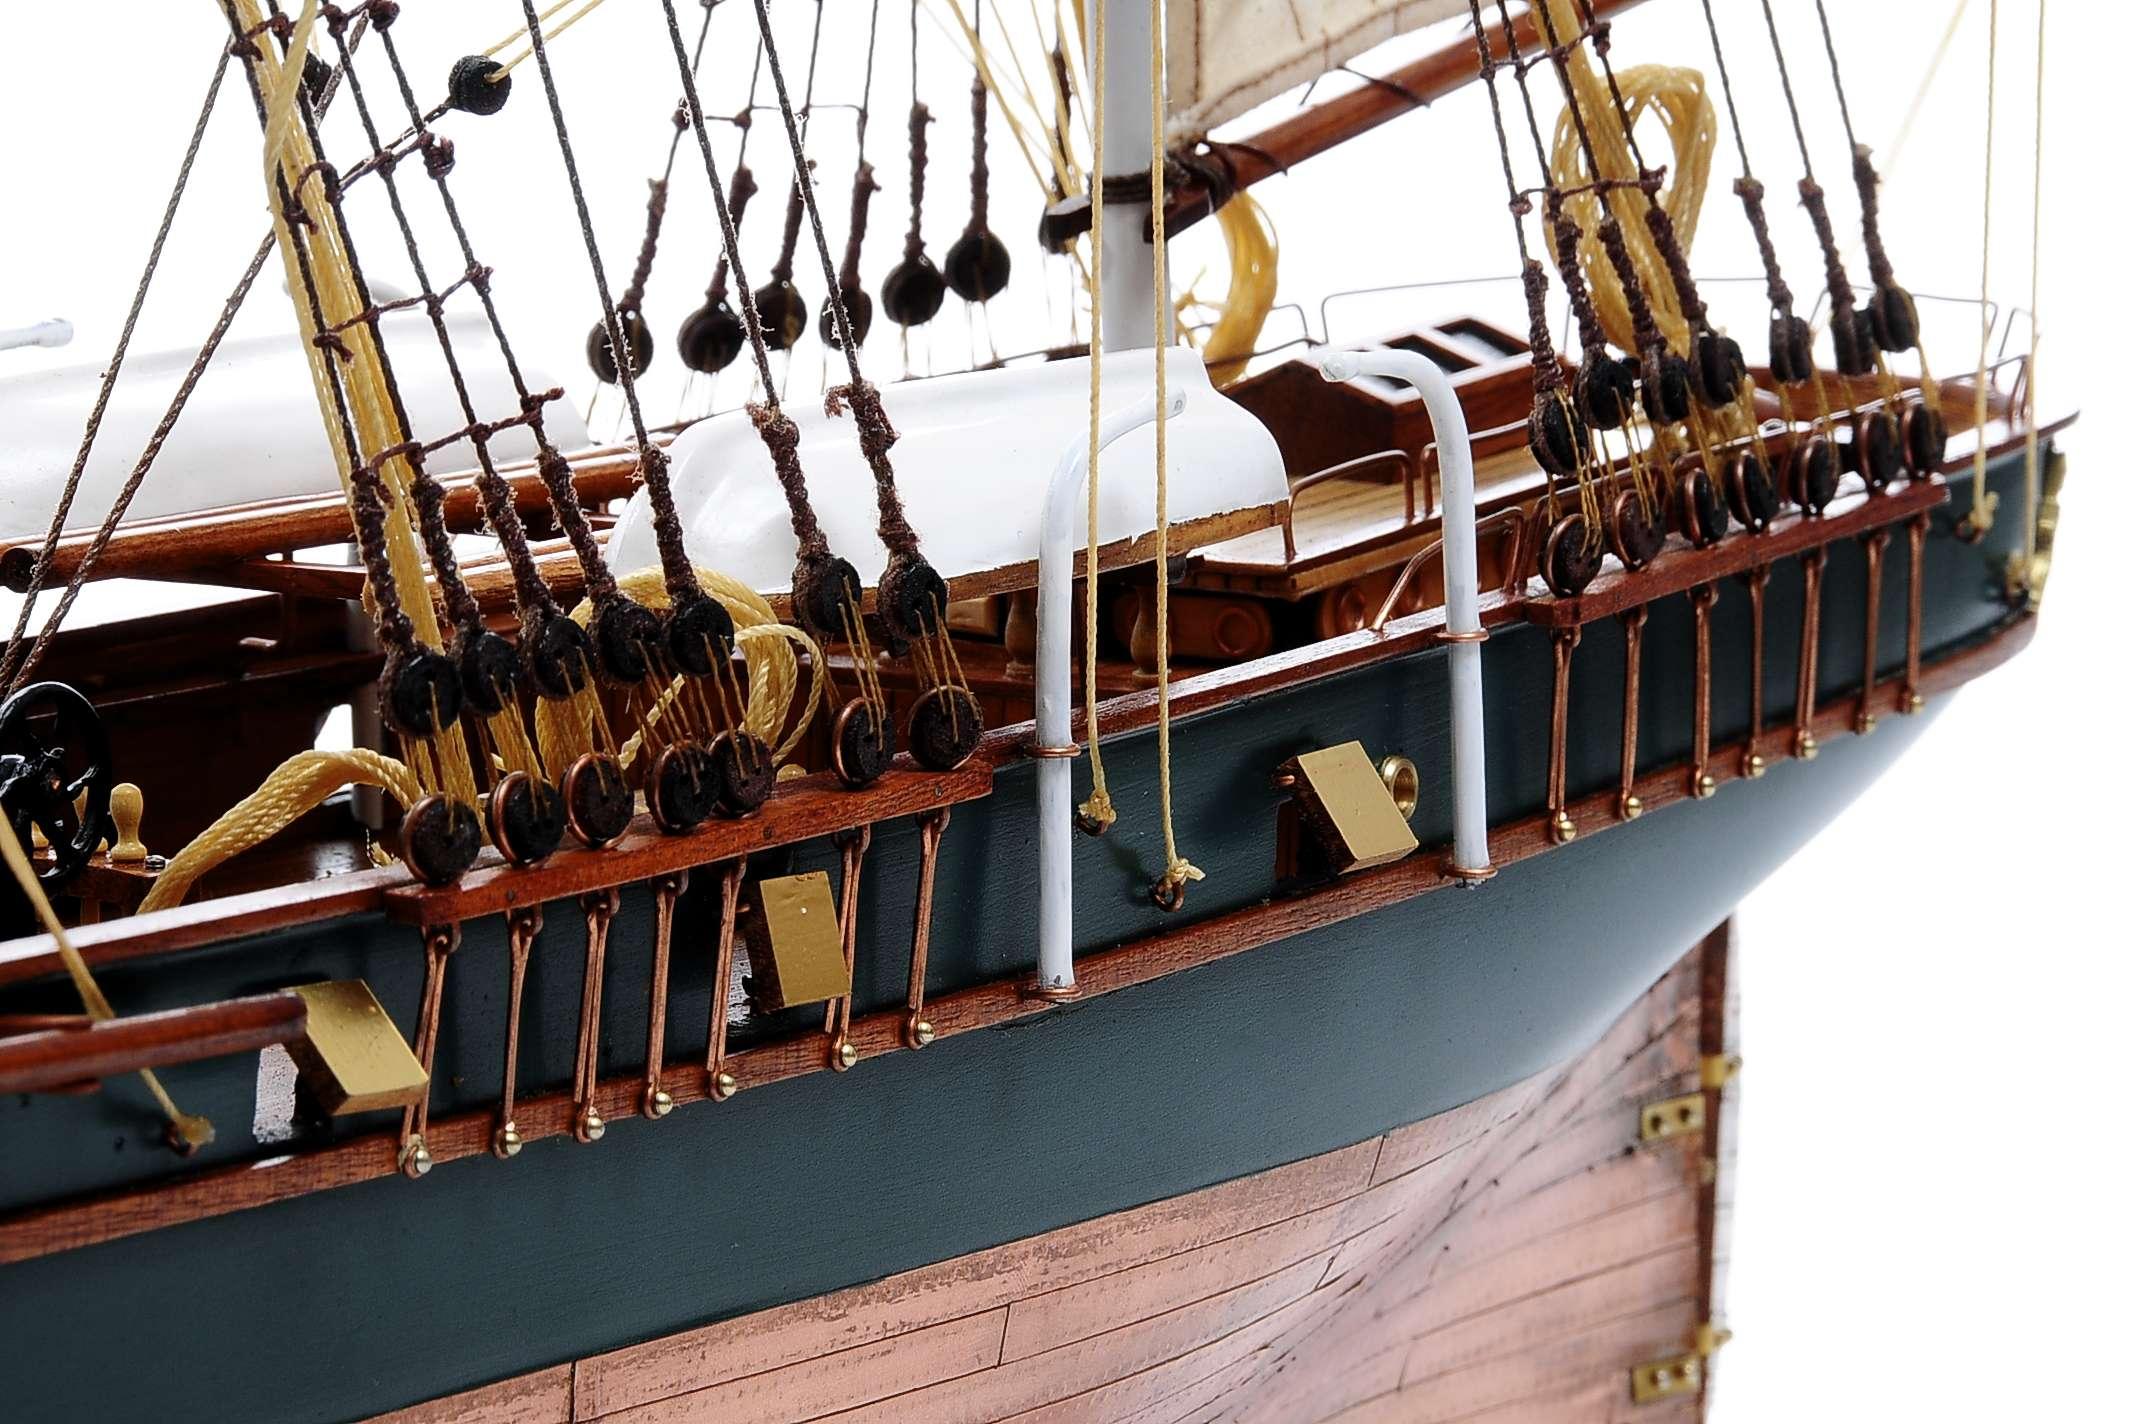 1434-4876-Thermopylae-Model-Boat